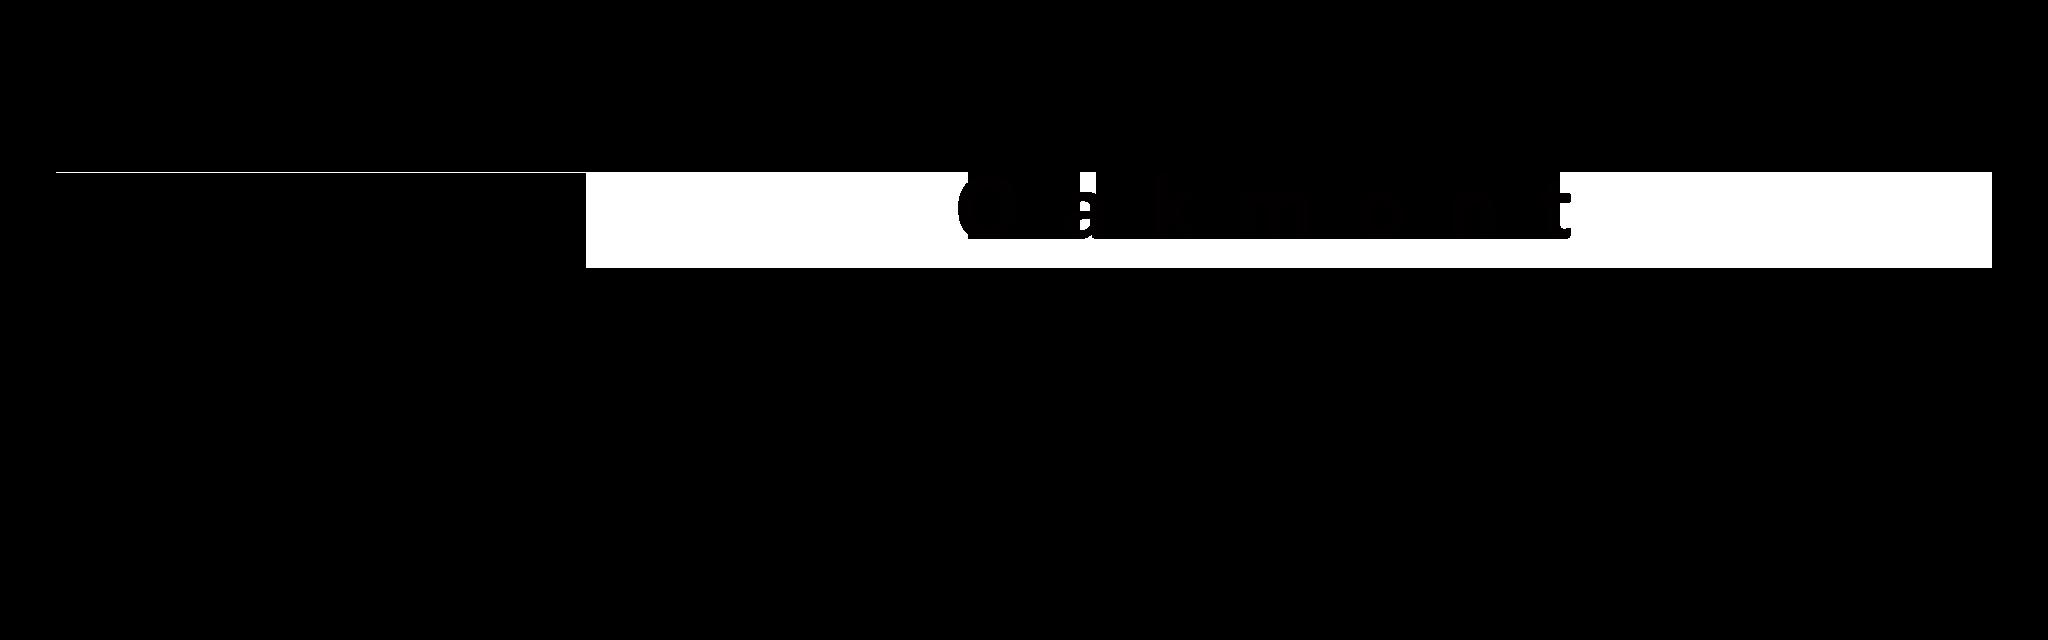 oakmont_musicivic_logo_transparent_2048x640